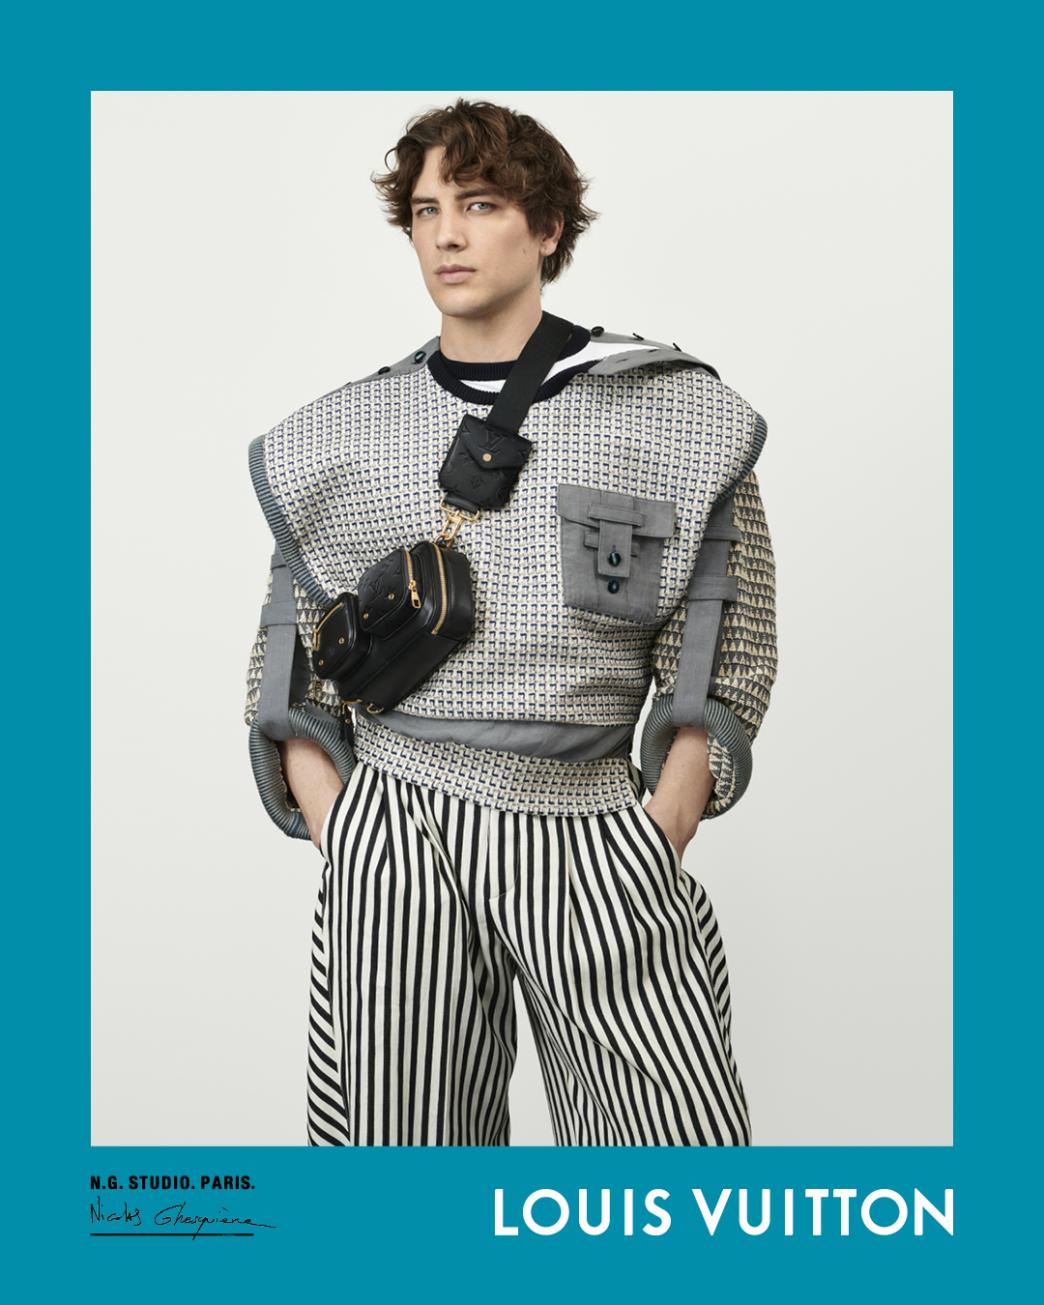 Эмма Стоун, Софи Тернер и другие звезды снялись в рекламе Louis Vuitton (ФОТО) - фото №3